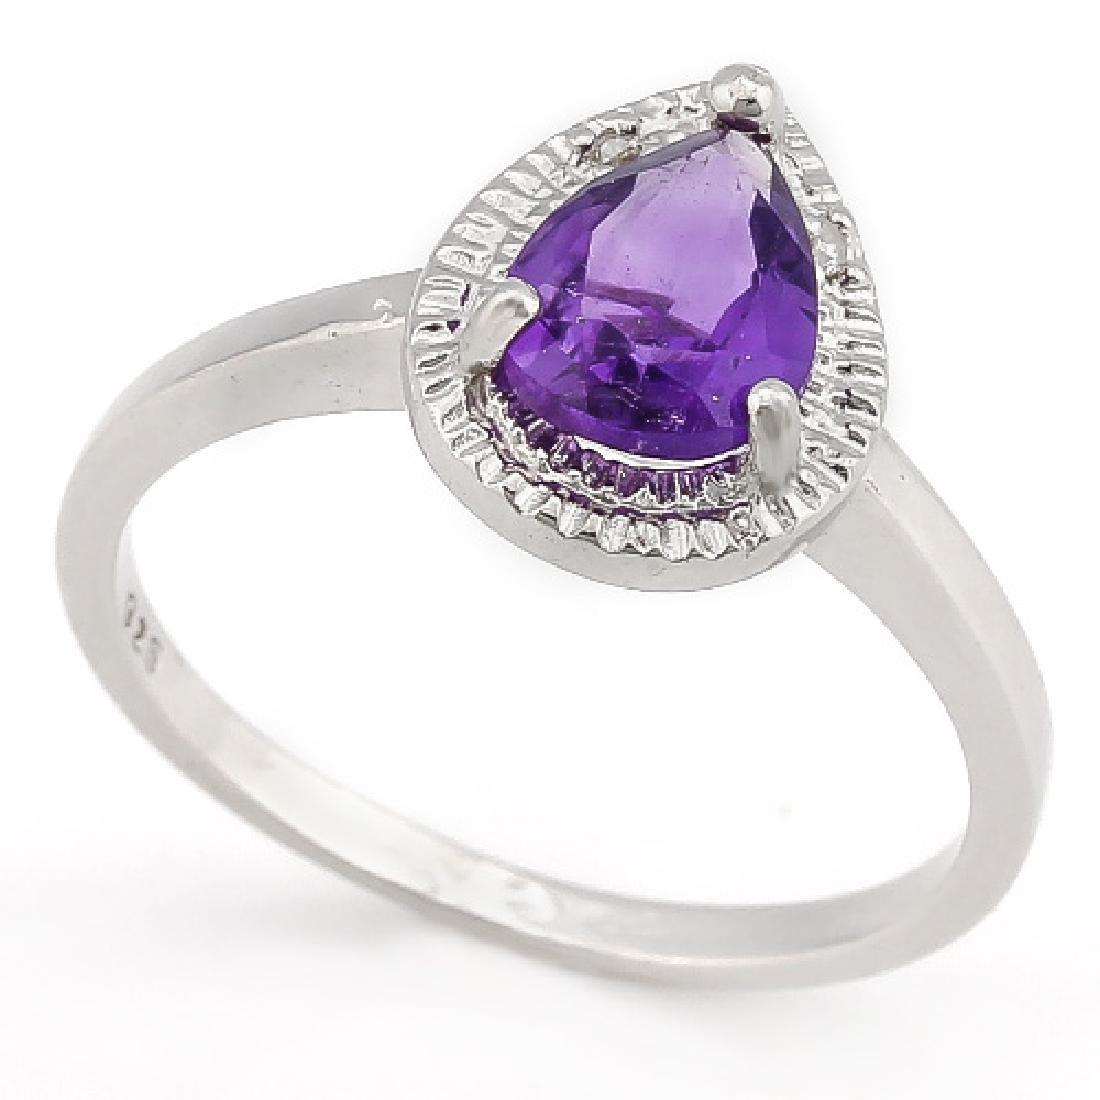 1 1/3 CARAT AMETHYST & DIAMOND 925 STERLING SILVER RING